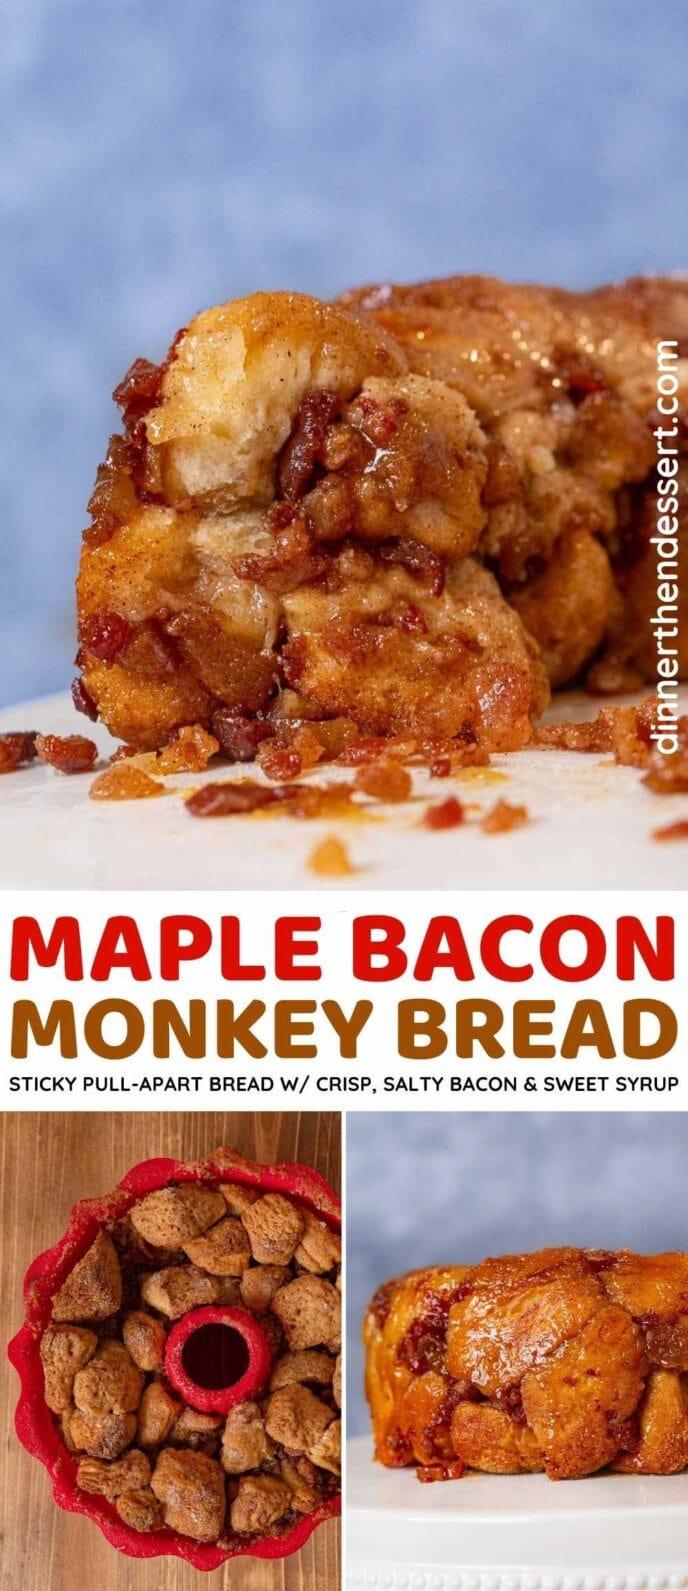 Maple Bacon Monkey Bread collage